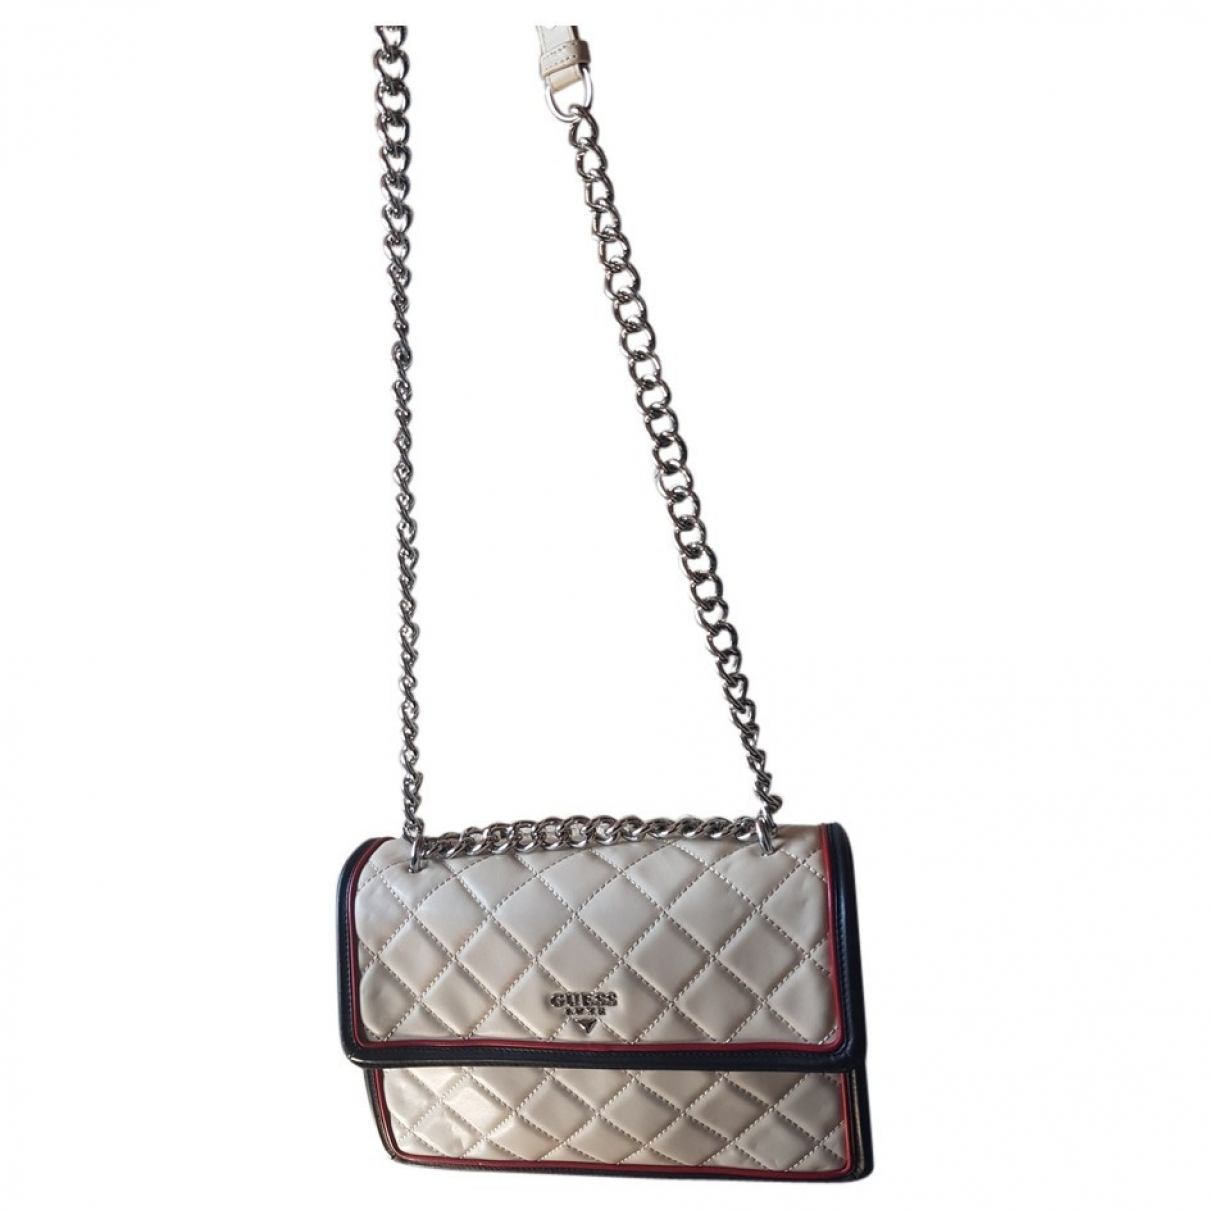 Guess \N Ecru Leather handbag for Women \N